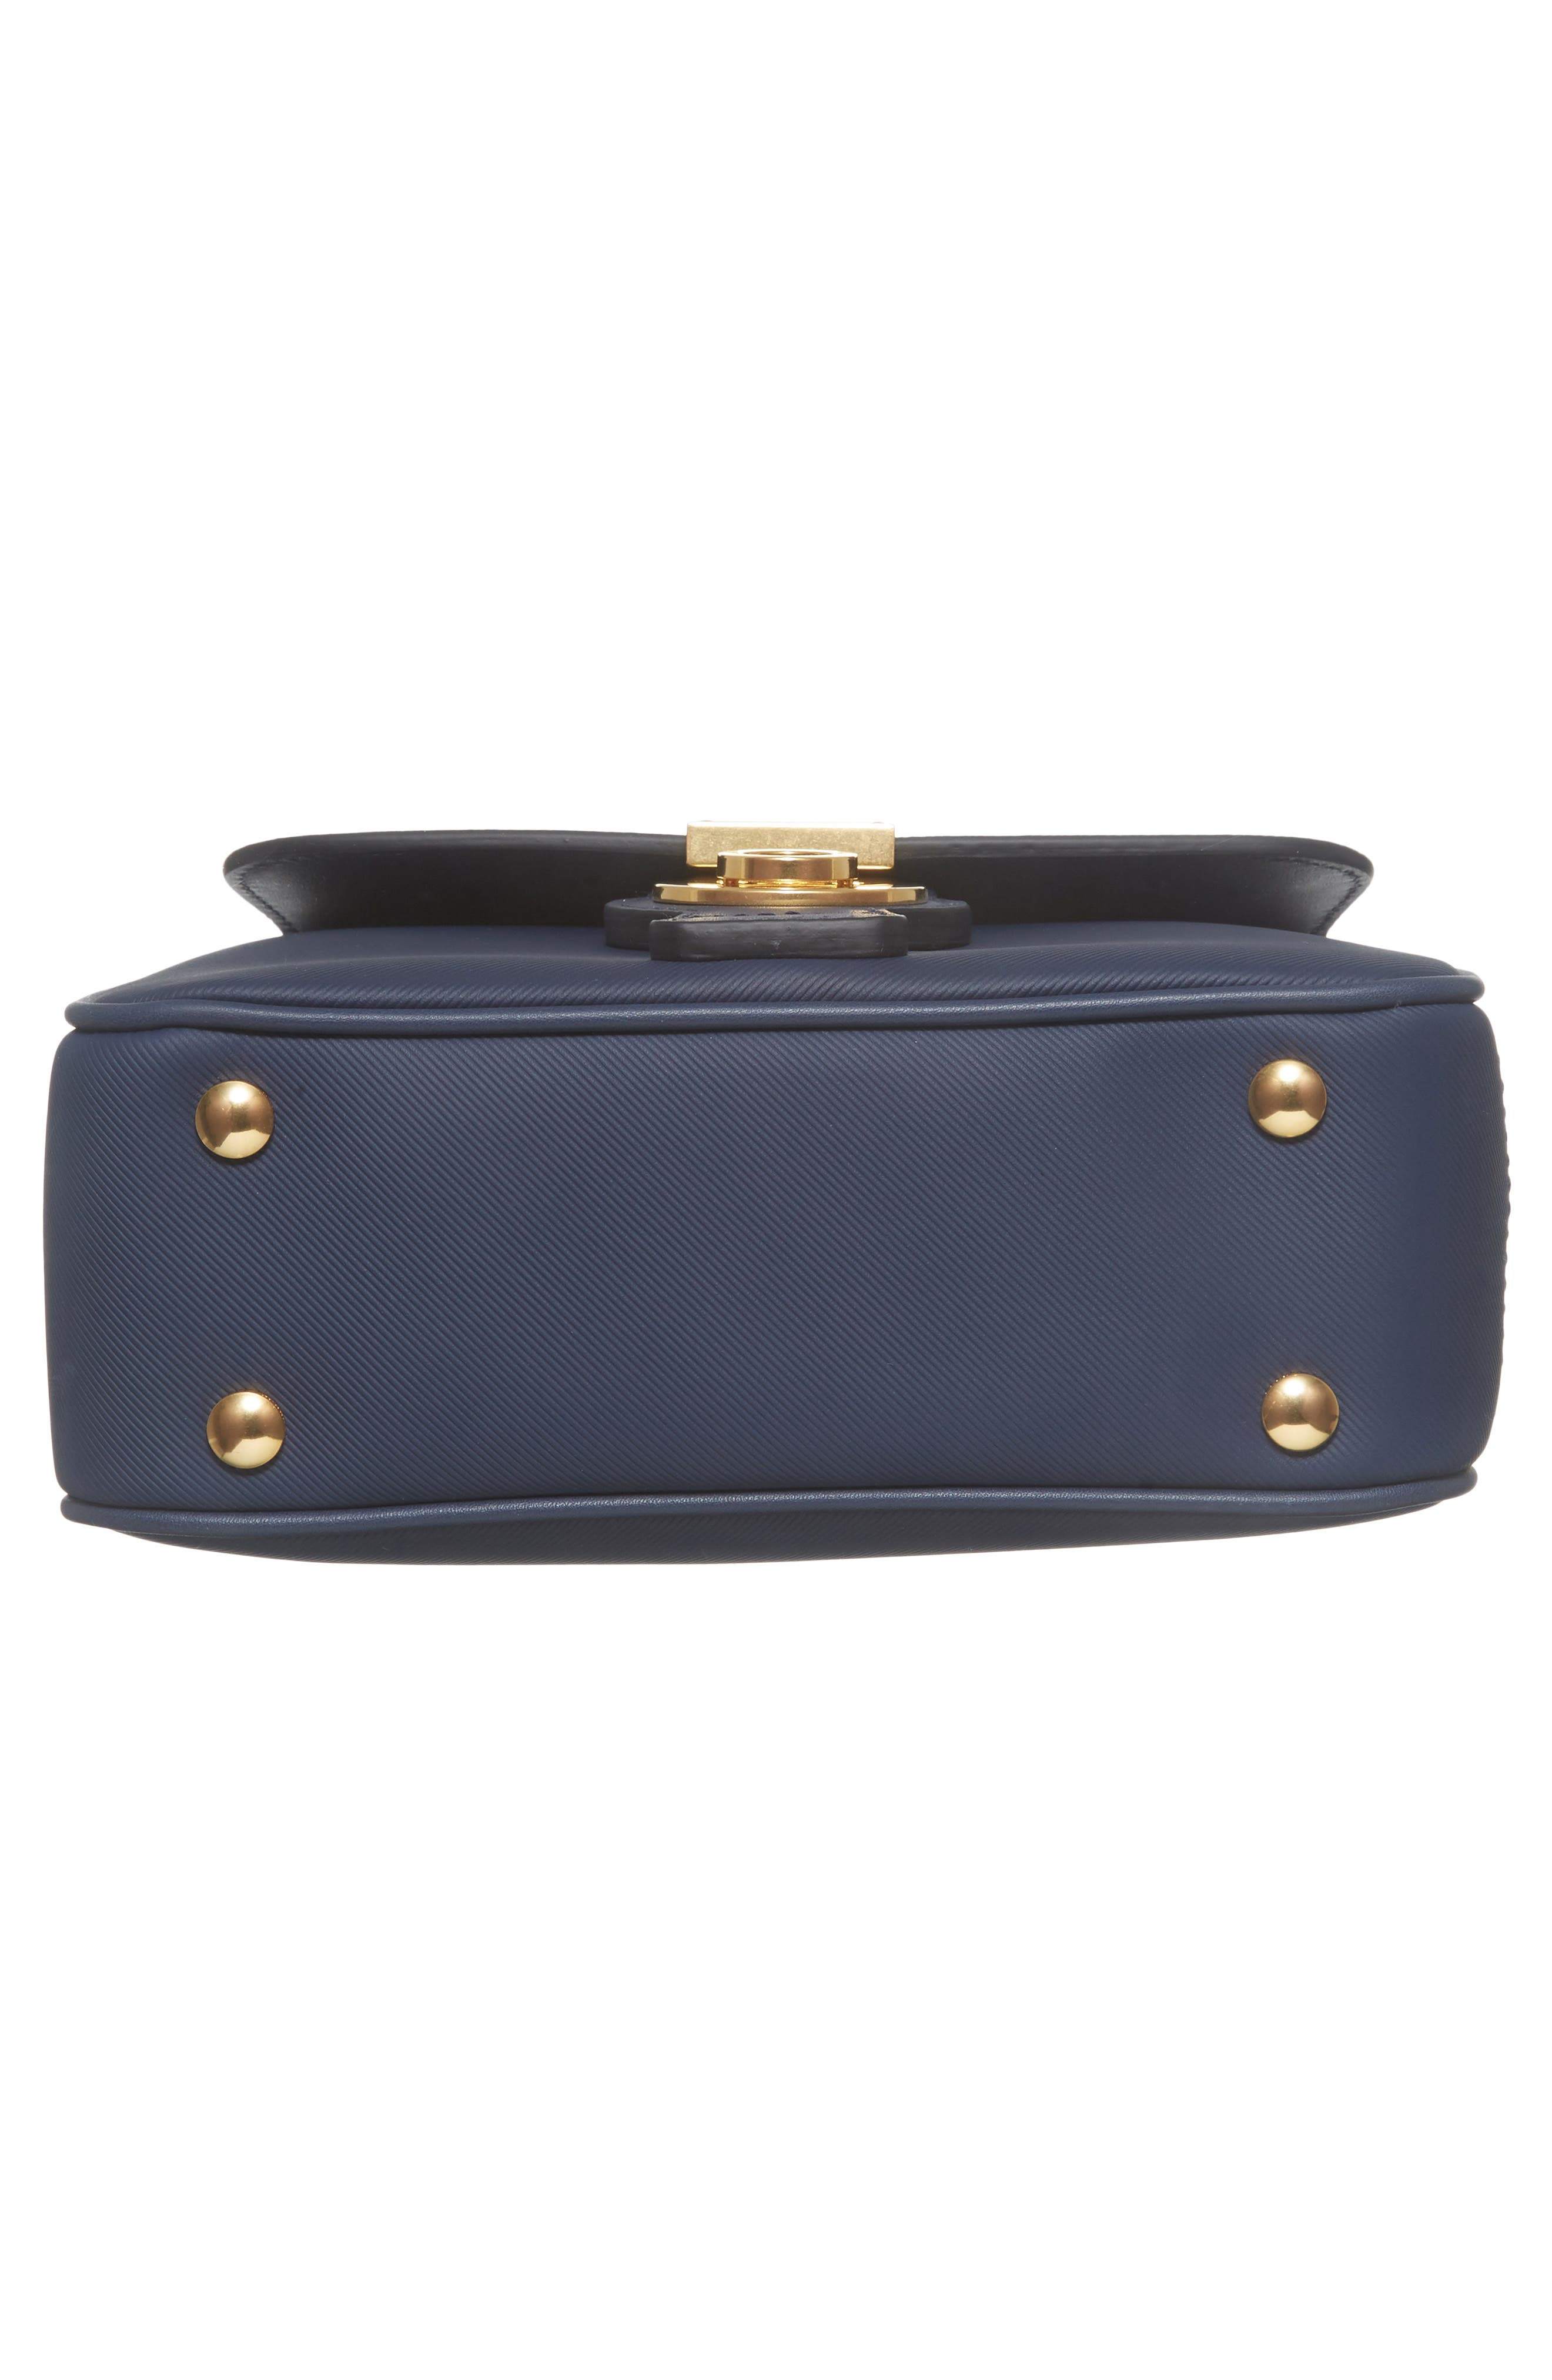 Medium DK88 Leather Satchel,                             Alternate thumbnail 4, color,                             Ink Blue